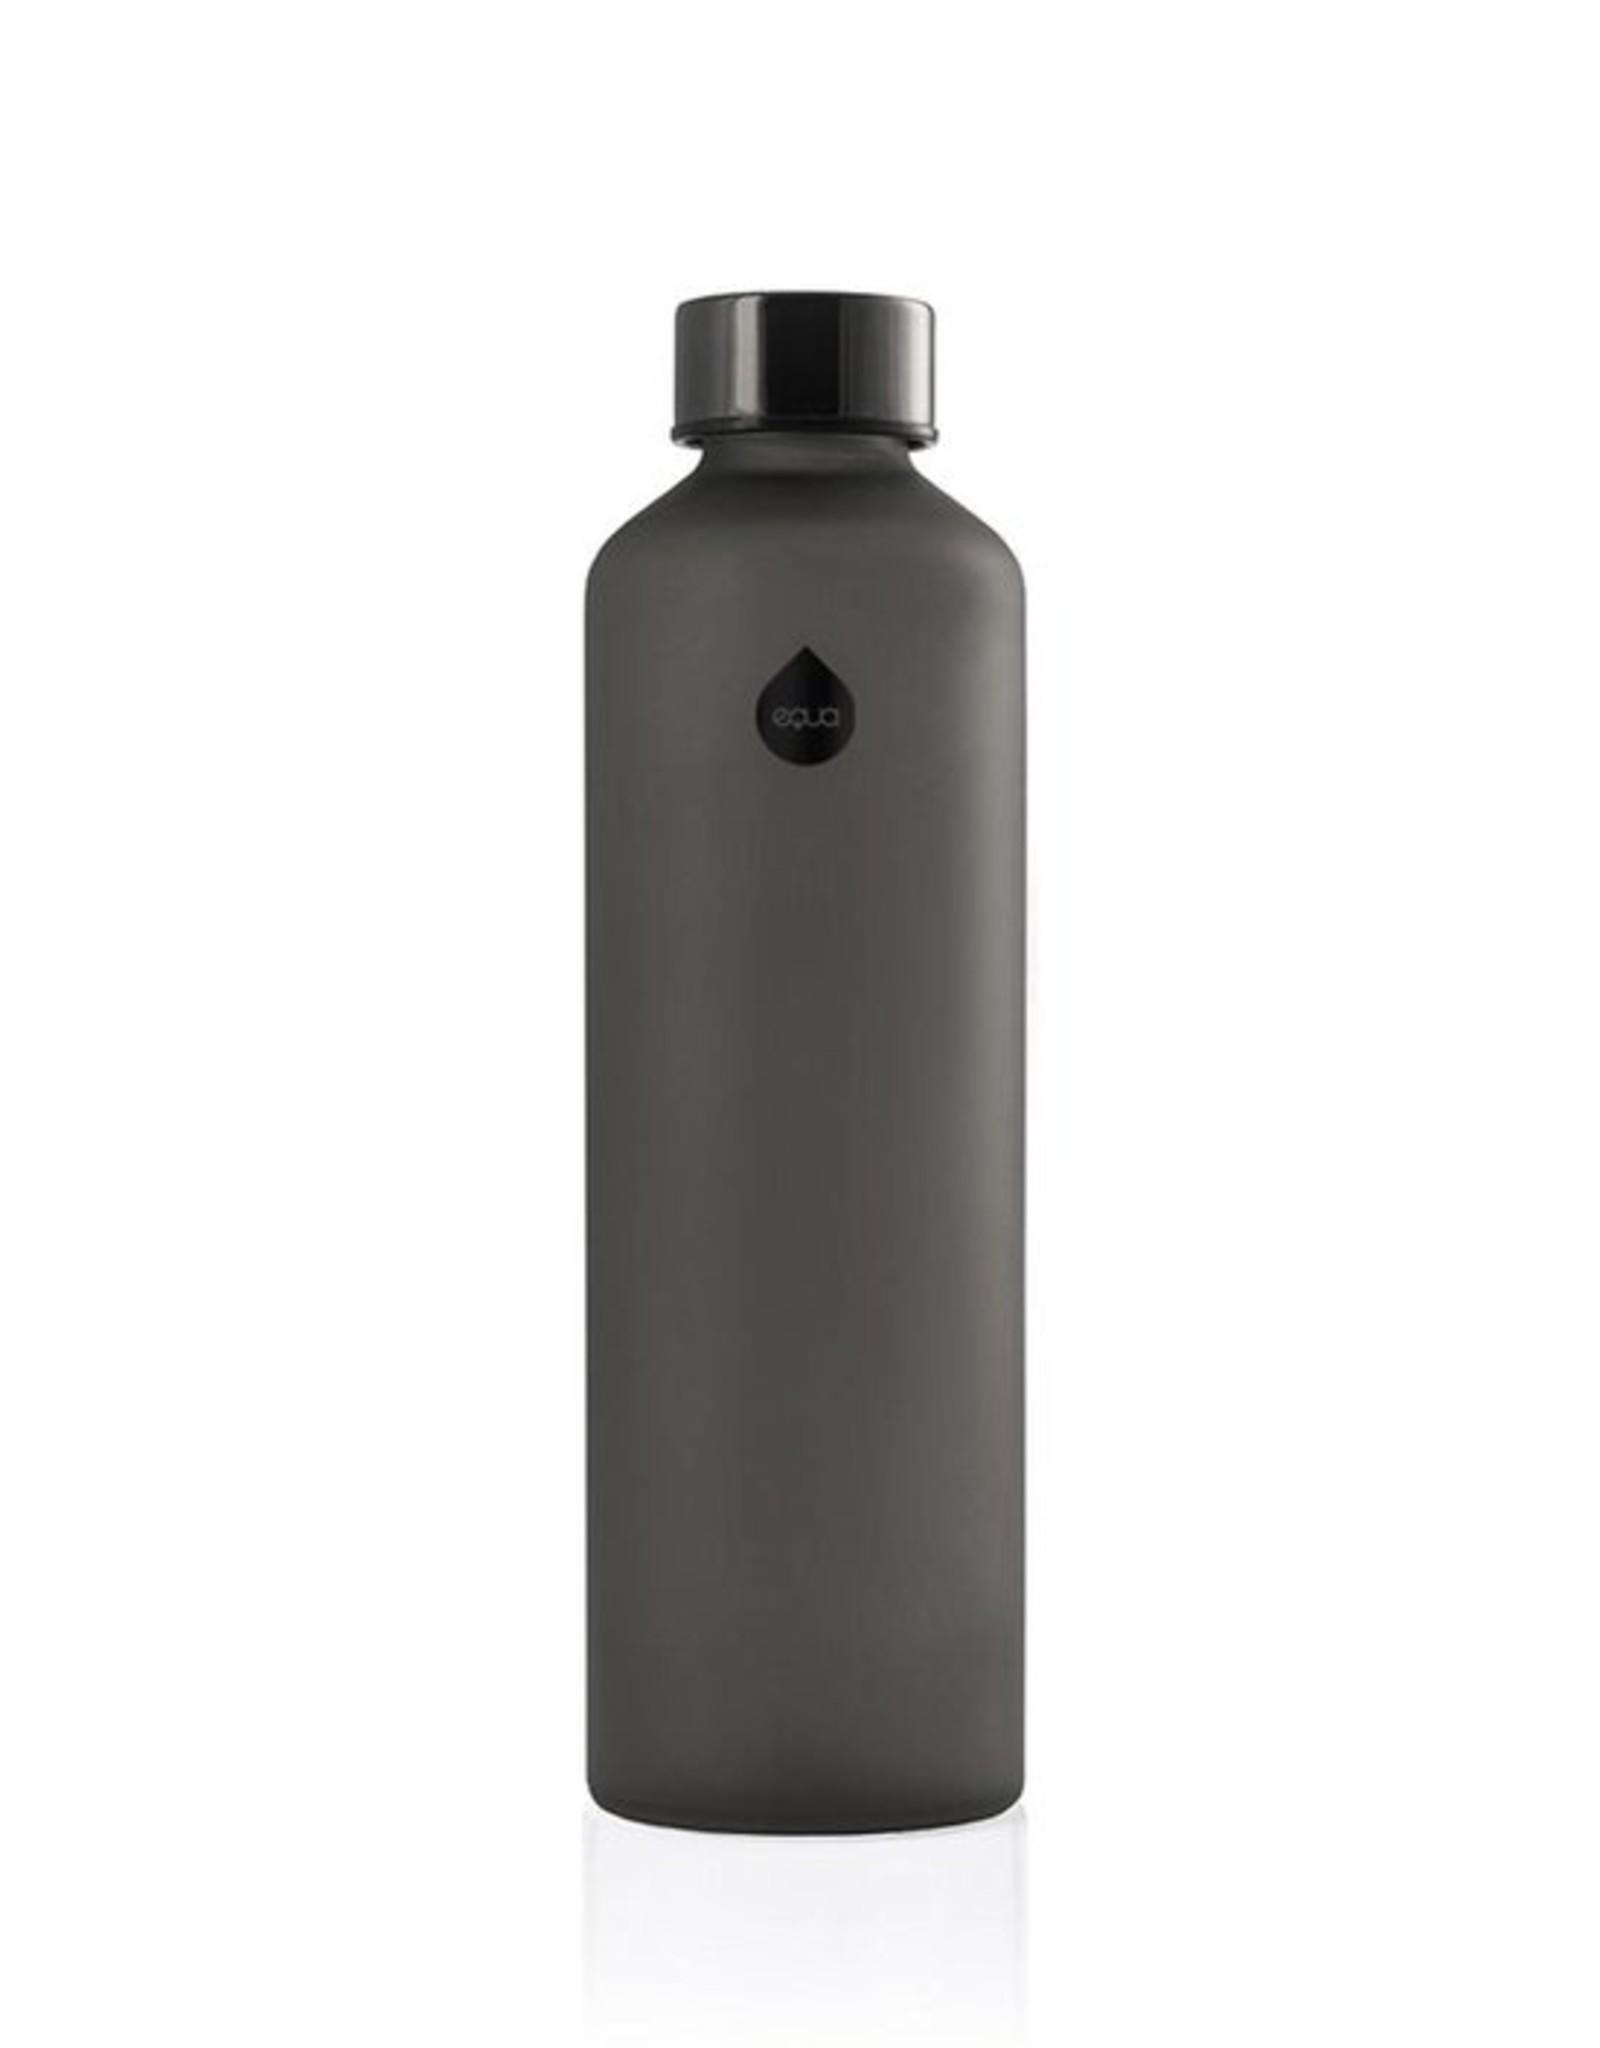 Equa Glazen drinkfles - Ash 750 ml